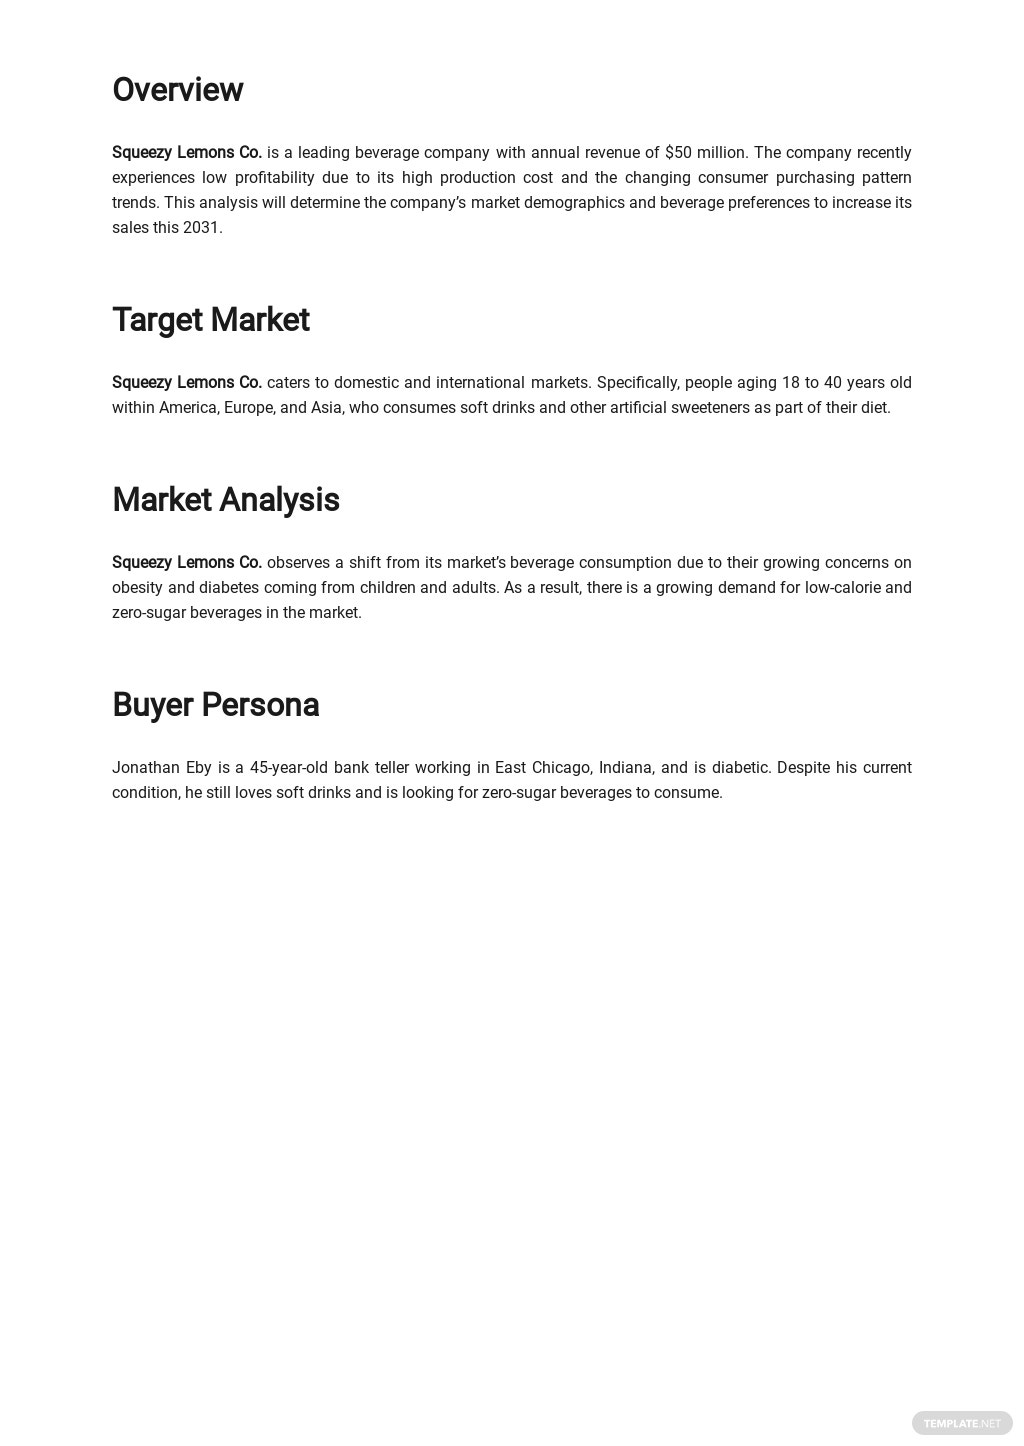 Blank Market Analysis Template 1.jpe